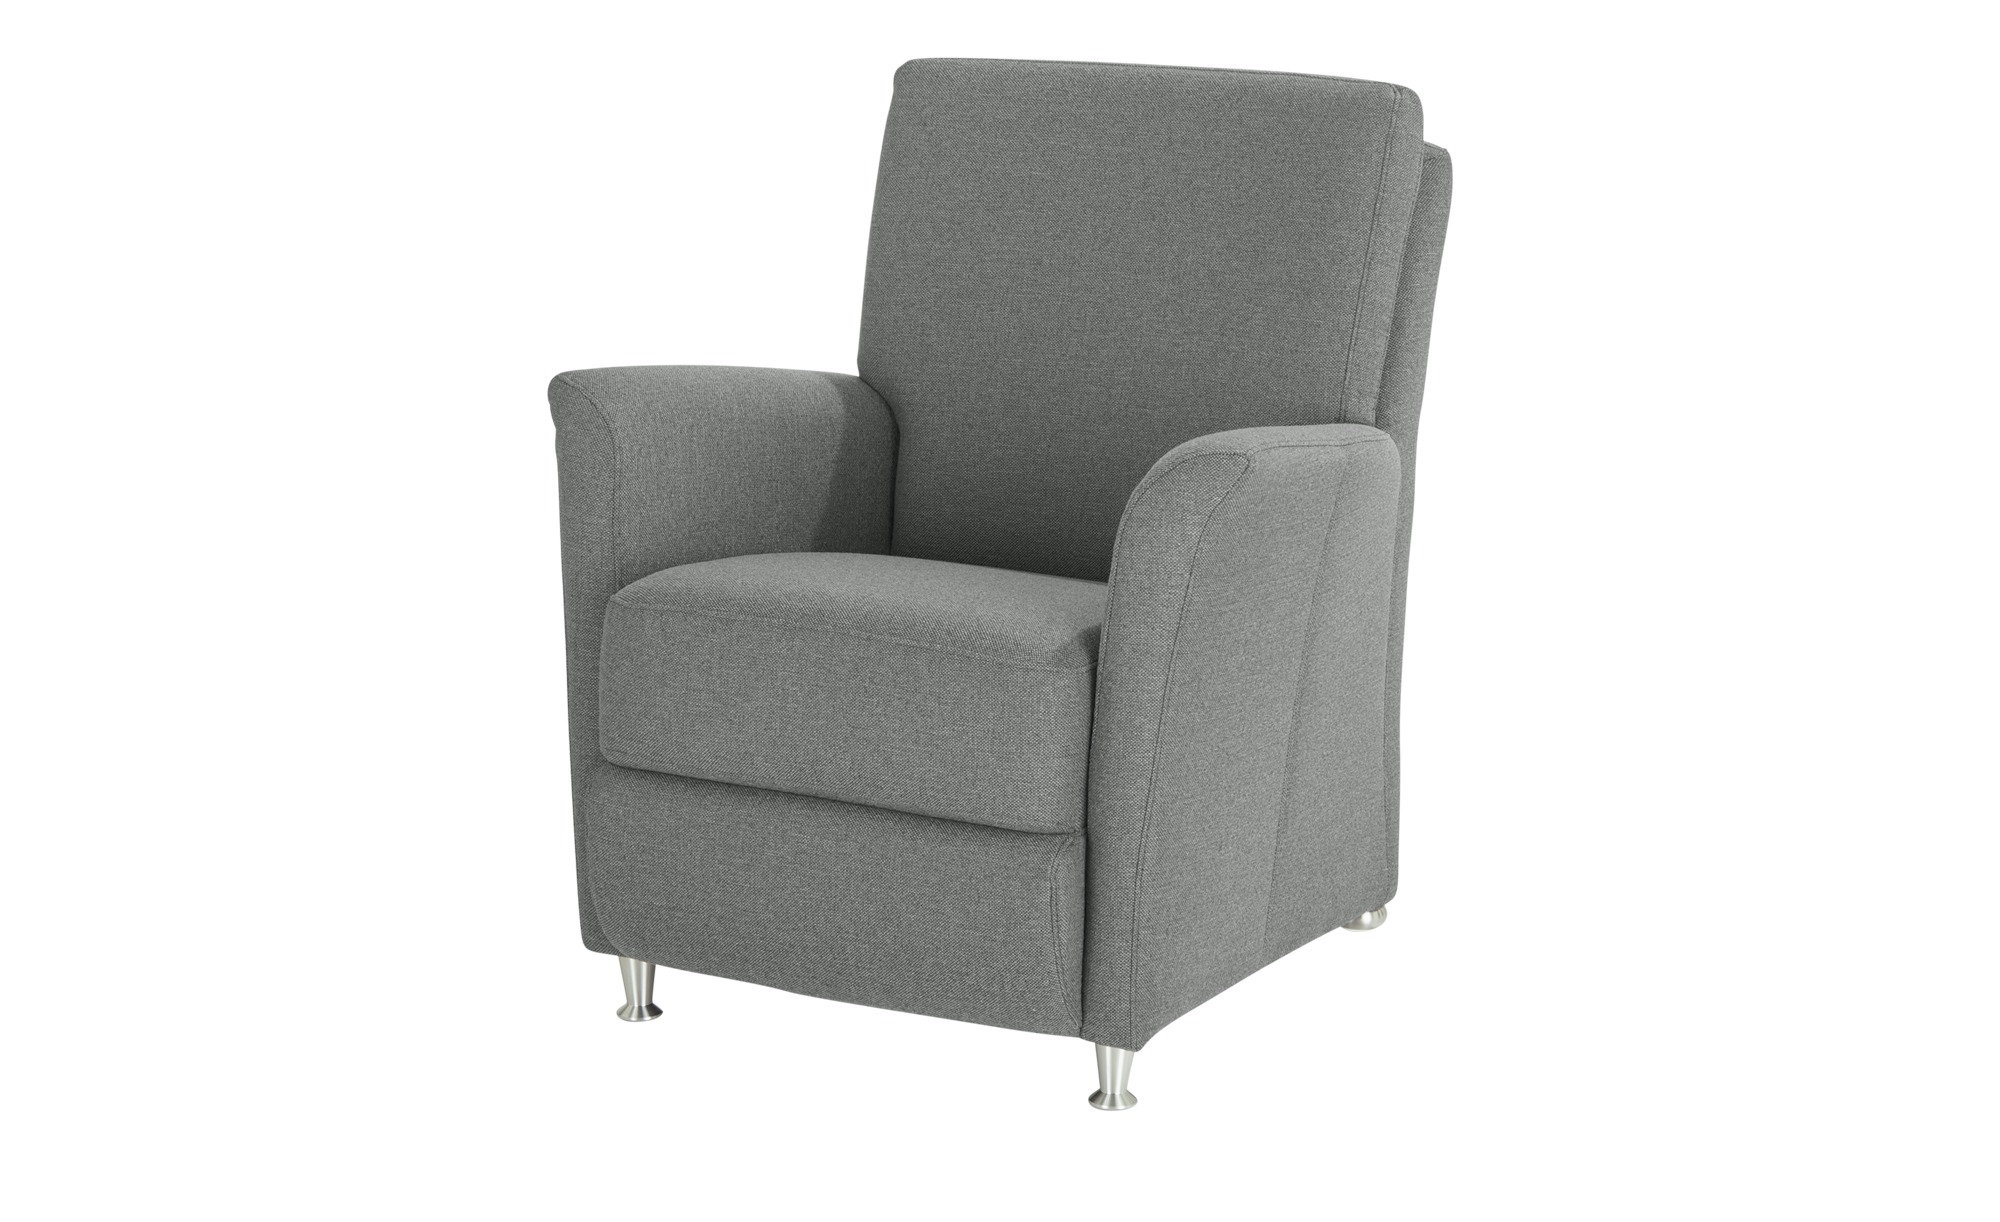 Wohnwert Sessel  Manuela ¦ grau ¦ Maße (cm): B: 76 H: 86 T: 82 Polstermöbel > Sessel > Polstersessel - Höffner